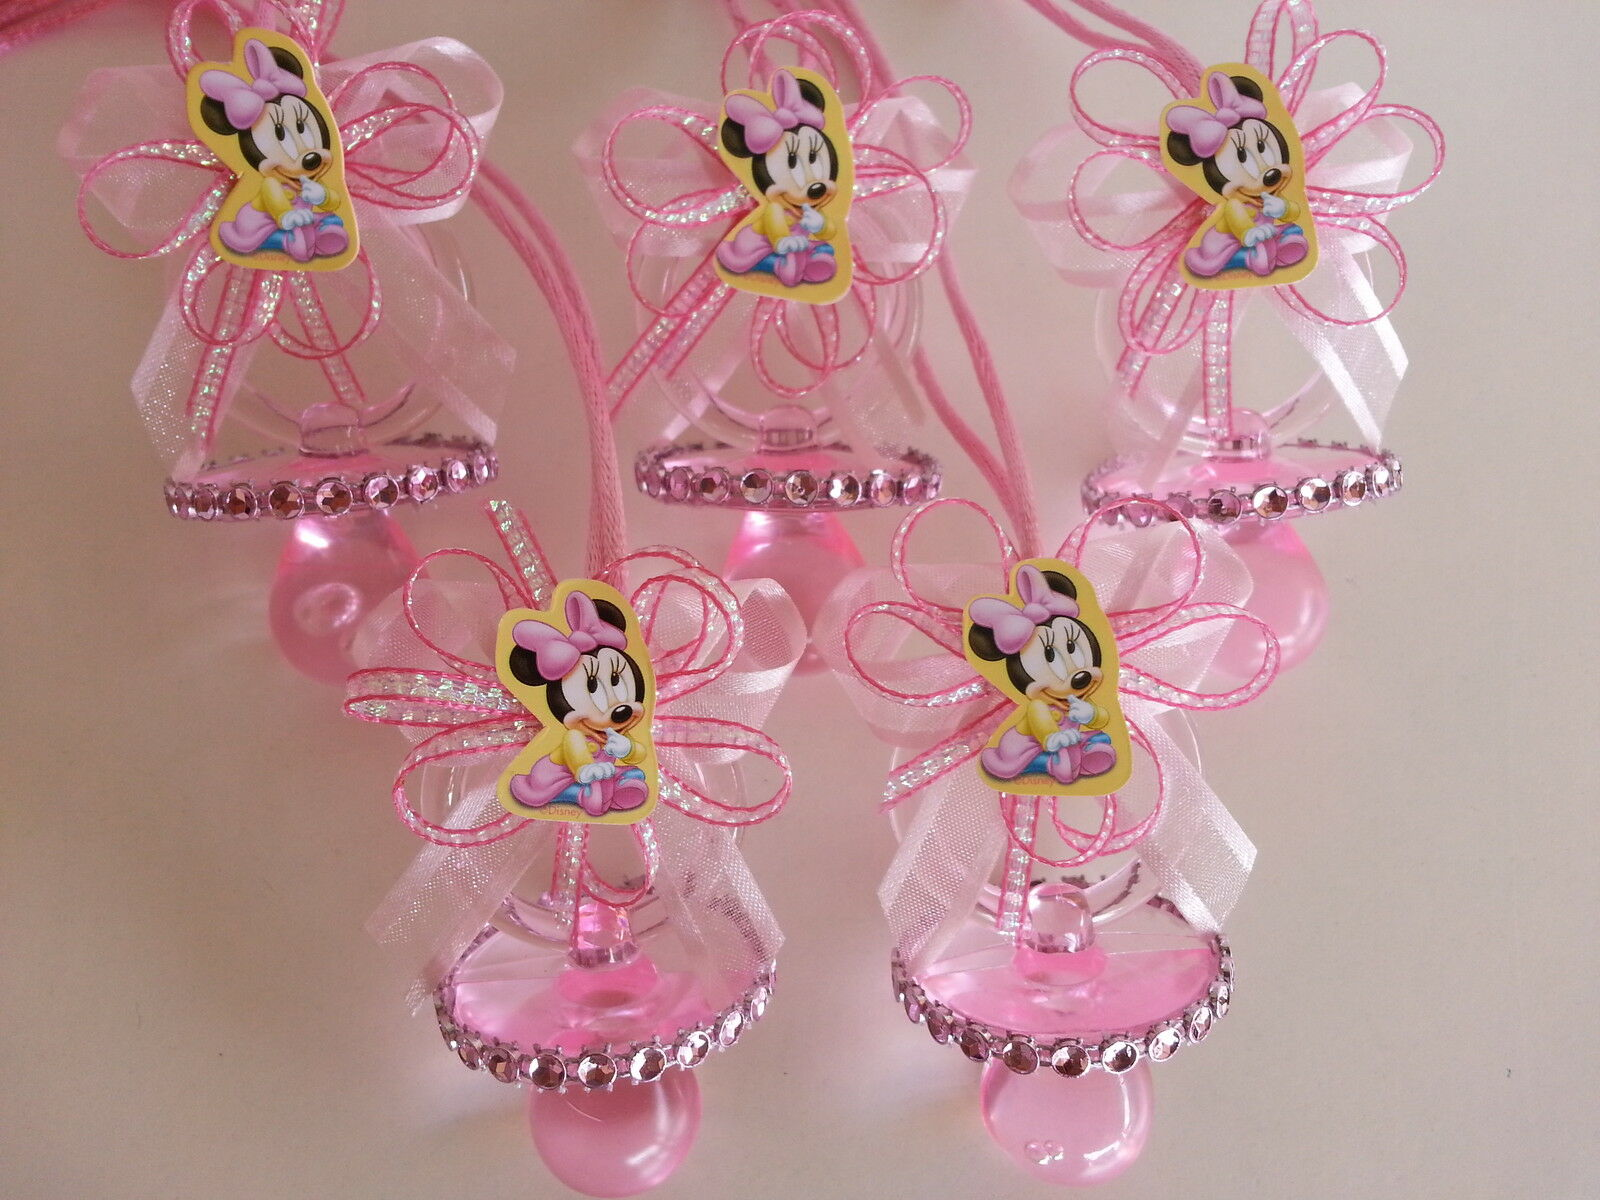 Minnie mouse centerpiece bottle large 14 baby shower piggy bank girl decoration ebay - Minnie mouse baby shower decorations ...